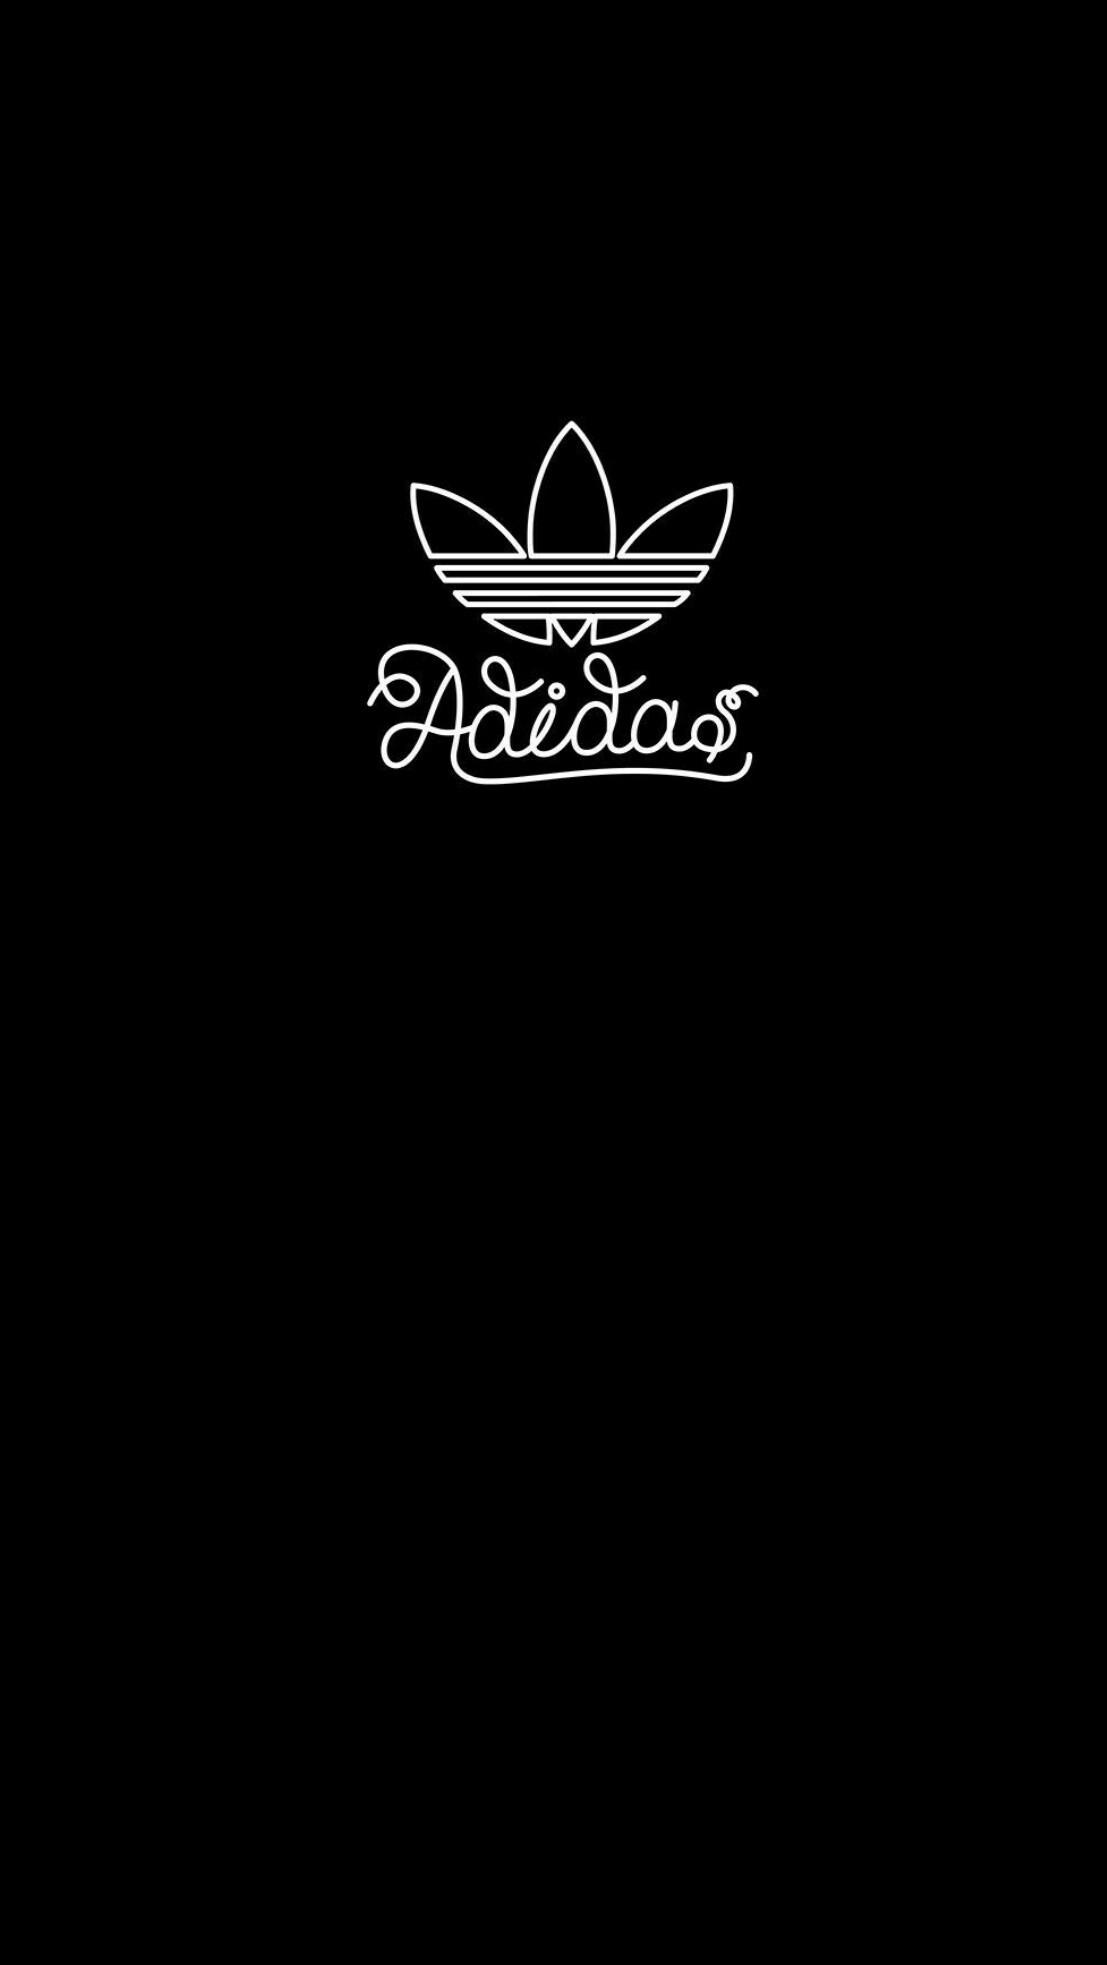 22 Adidas Wallpaper Black On Wallpapersafari